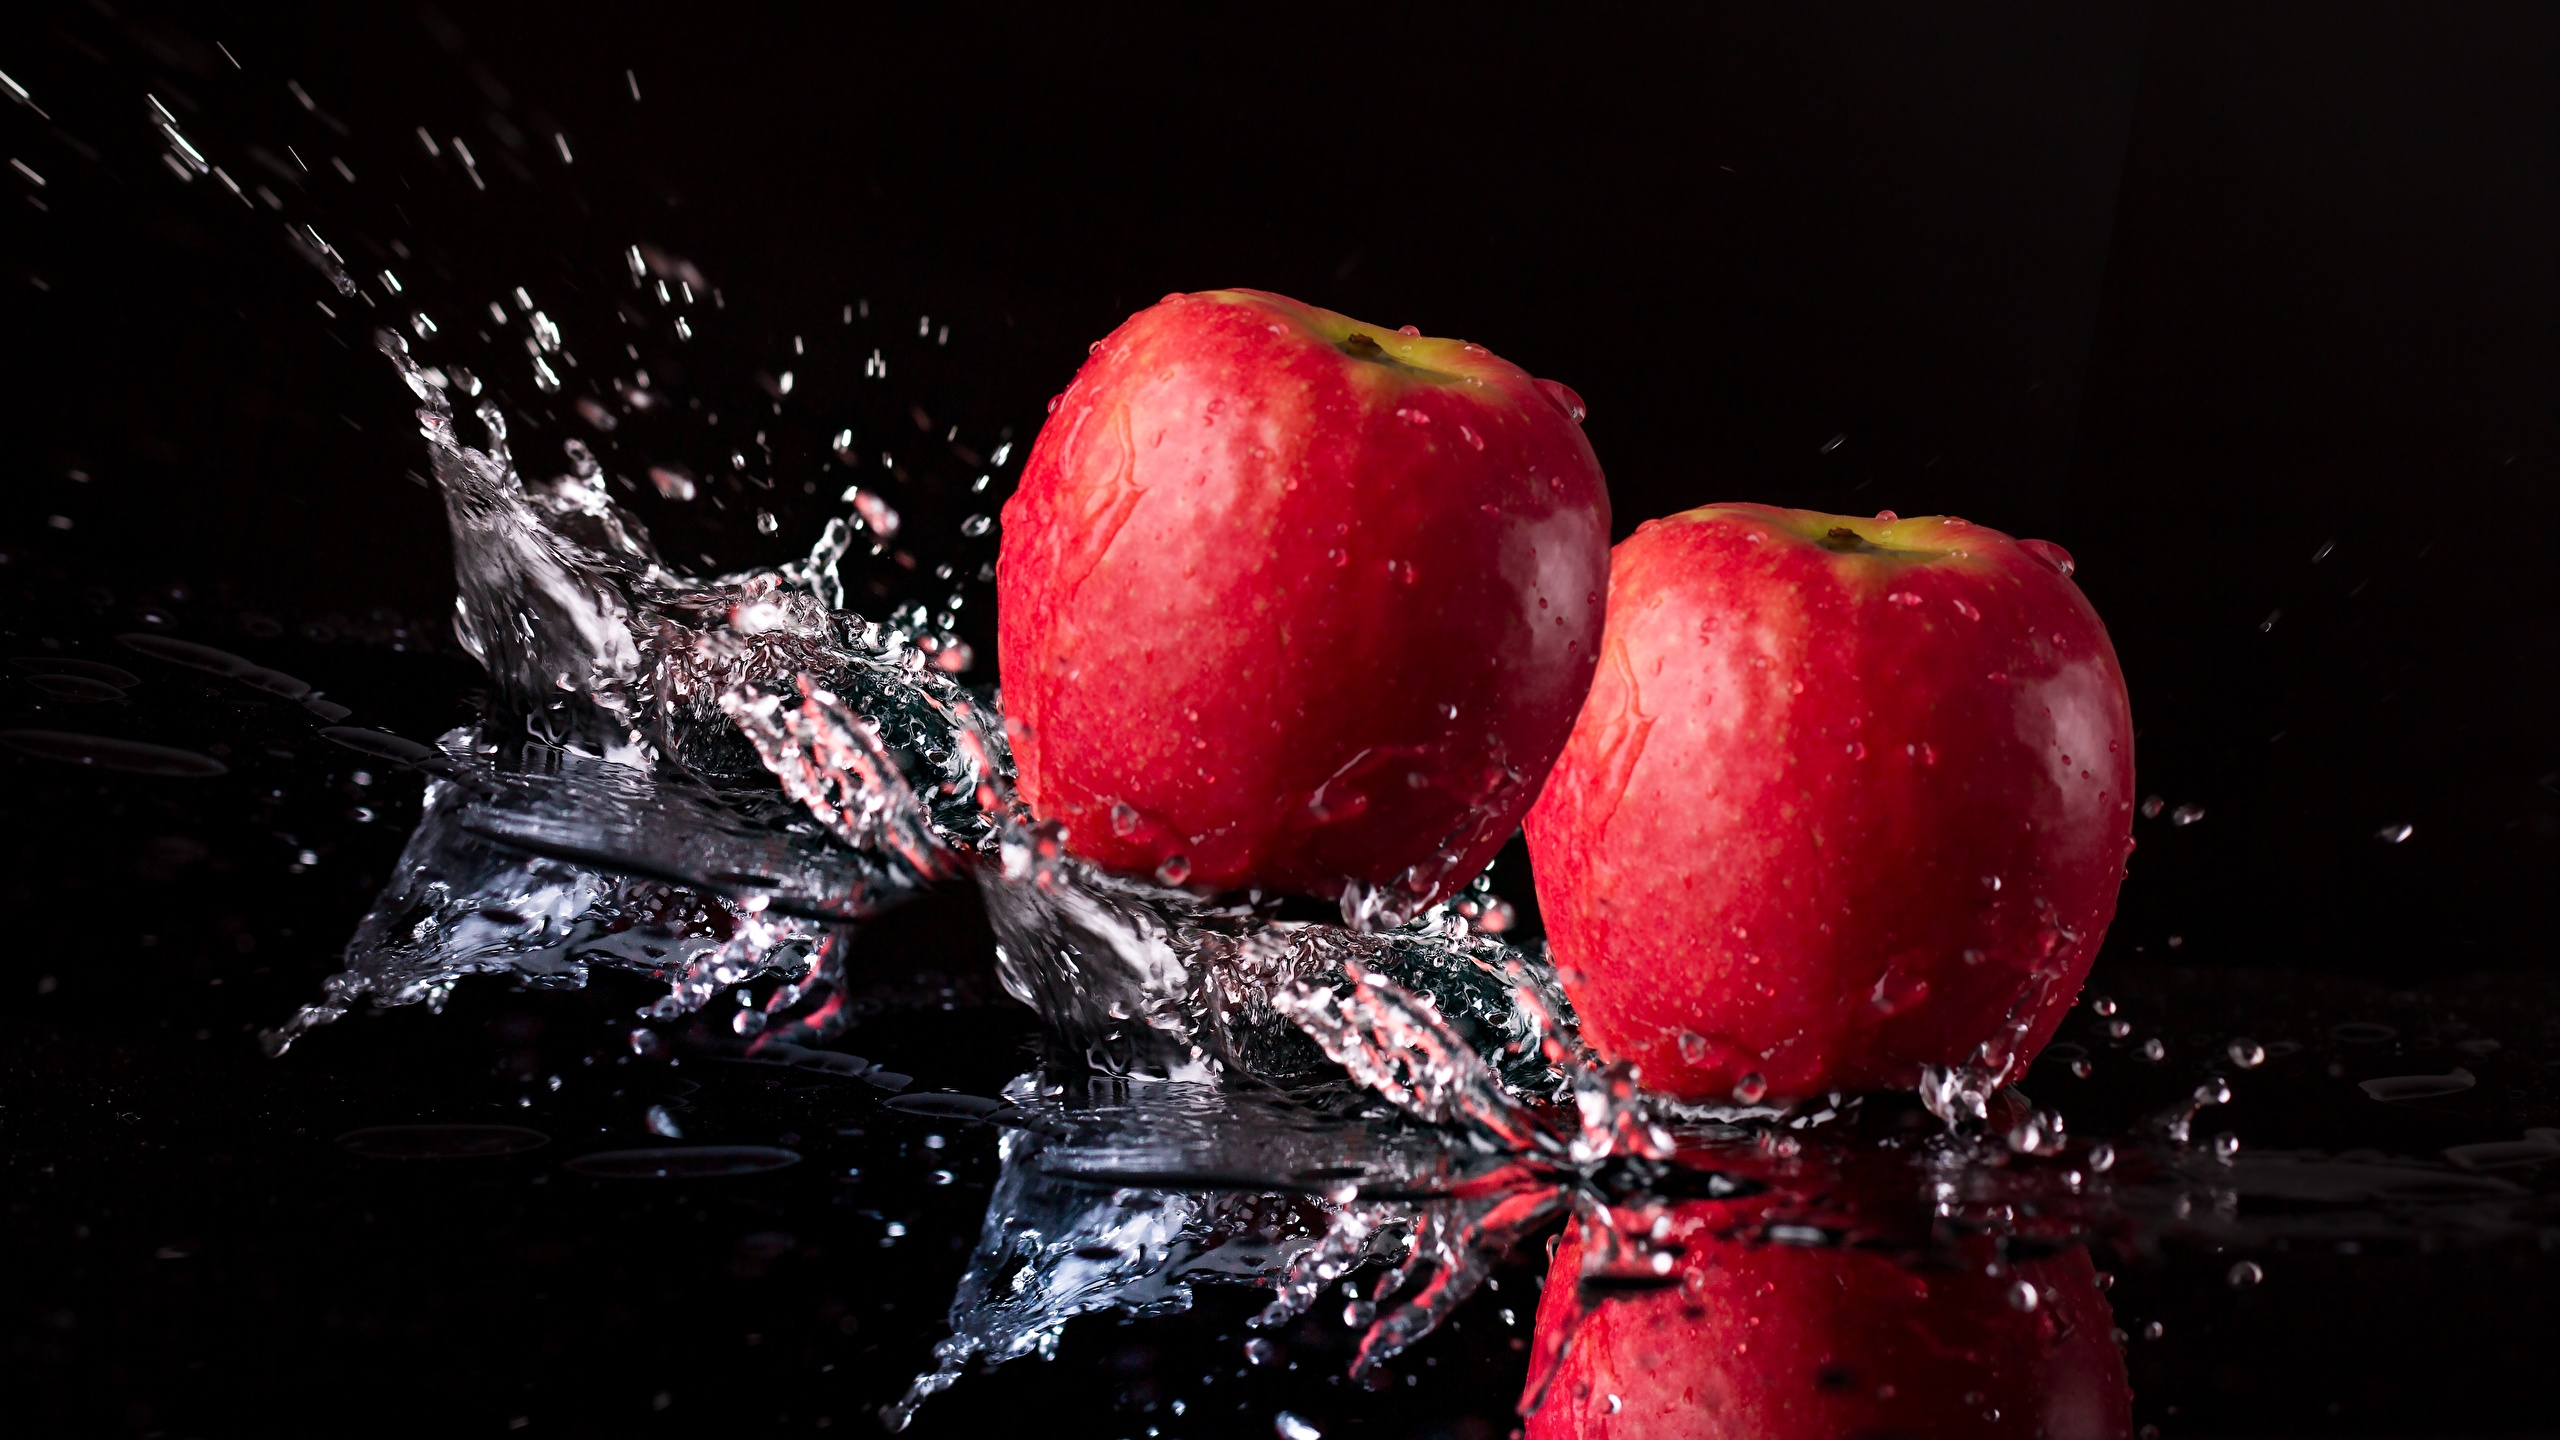 Fonds Decran 2560x1440 Pommes En Gros Plan Fond Noir